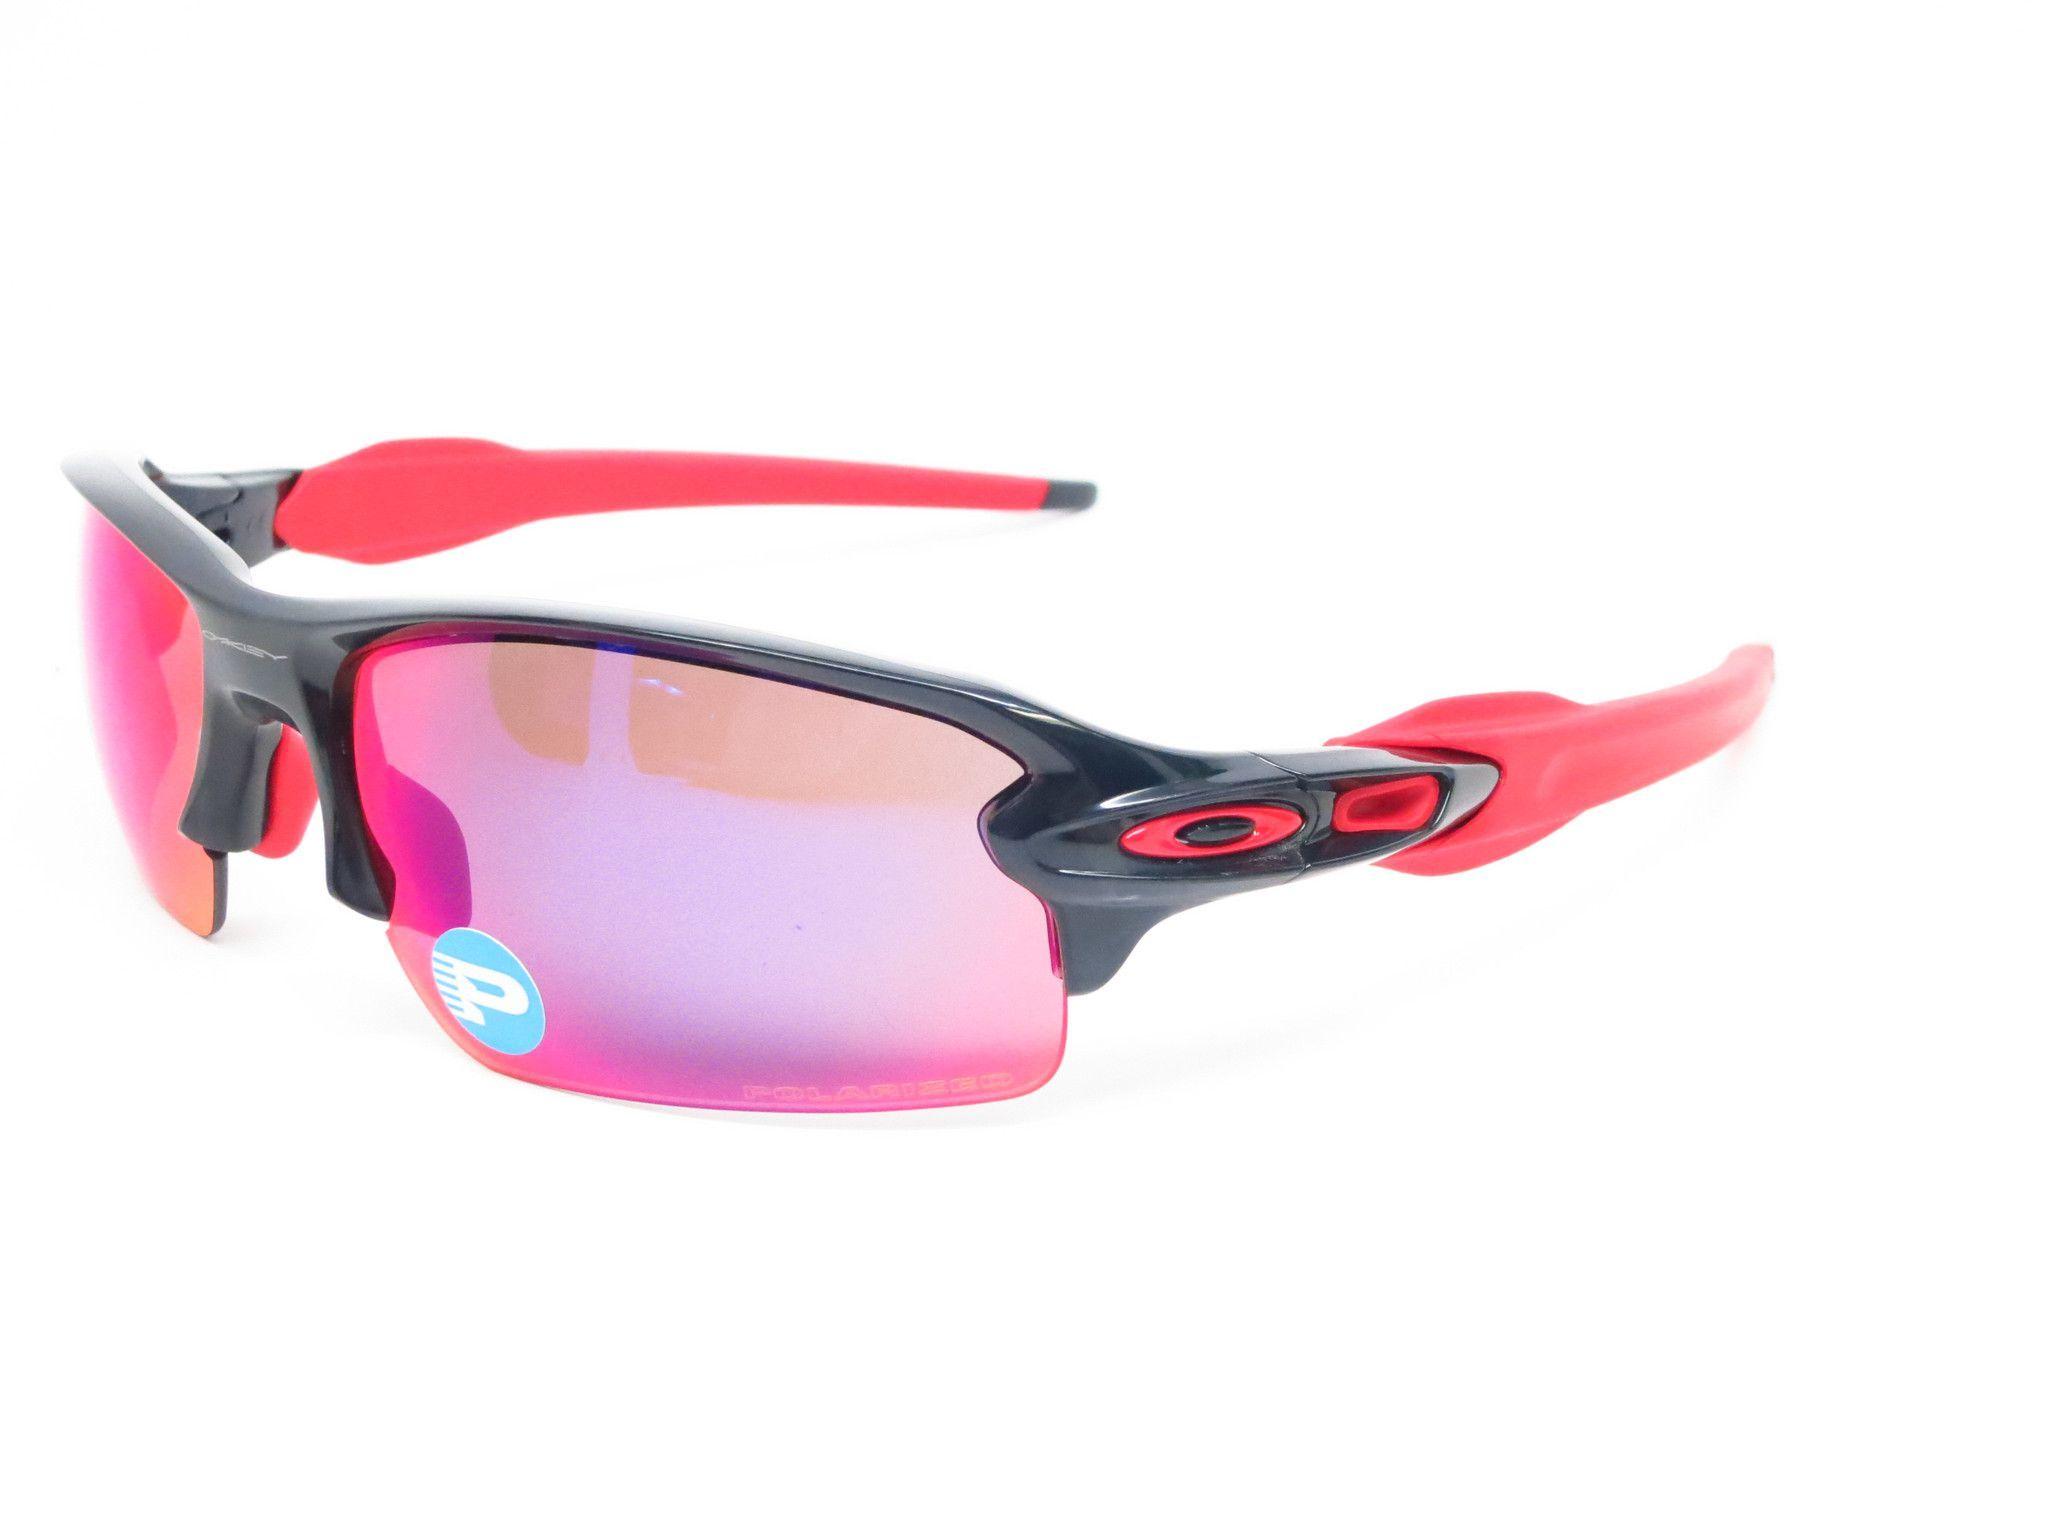 b1722632b641b Oakley Flak 2.0 OO9295-08 Black Ink Polarized Sunglasses